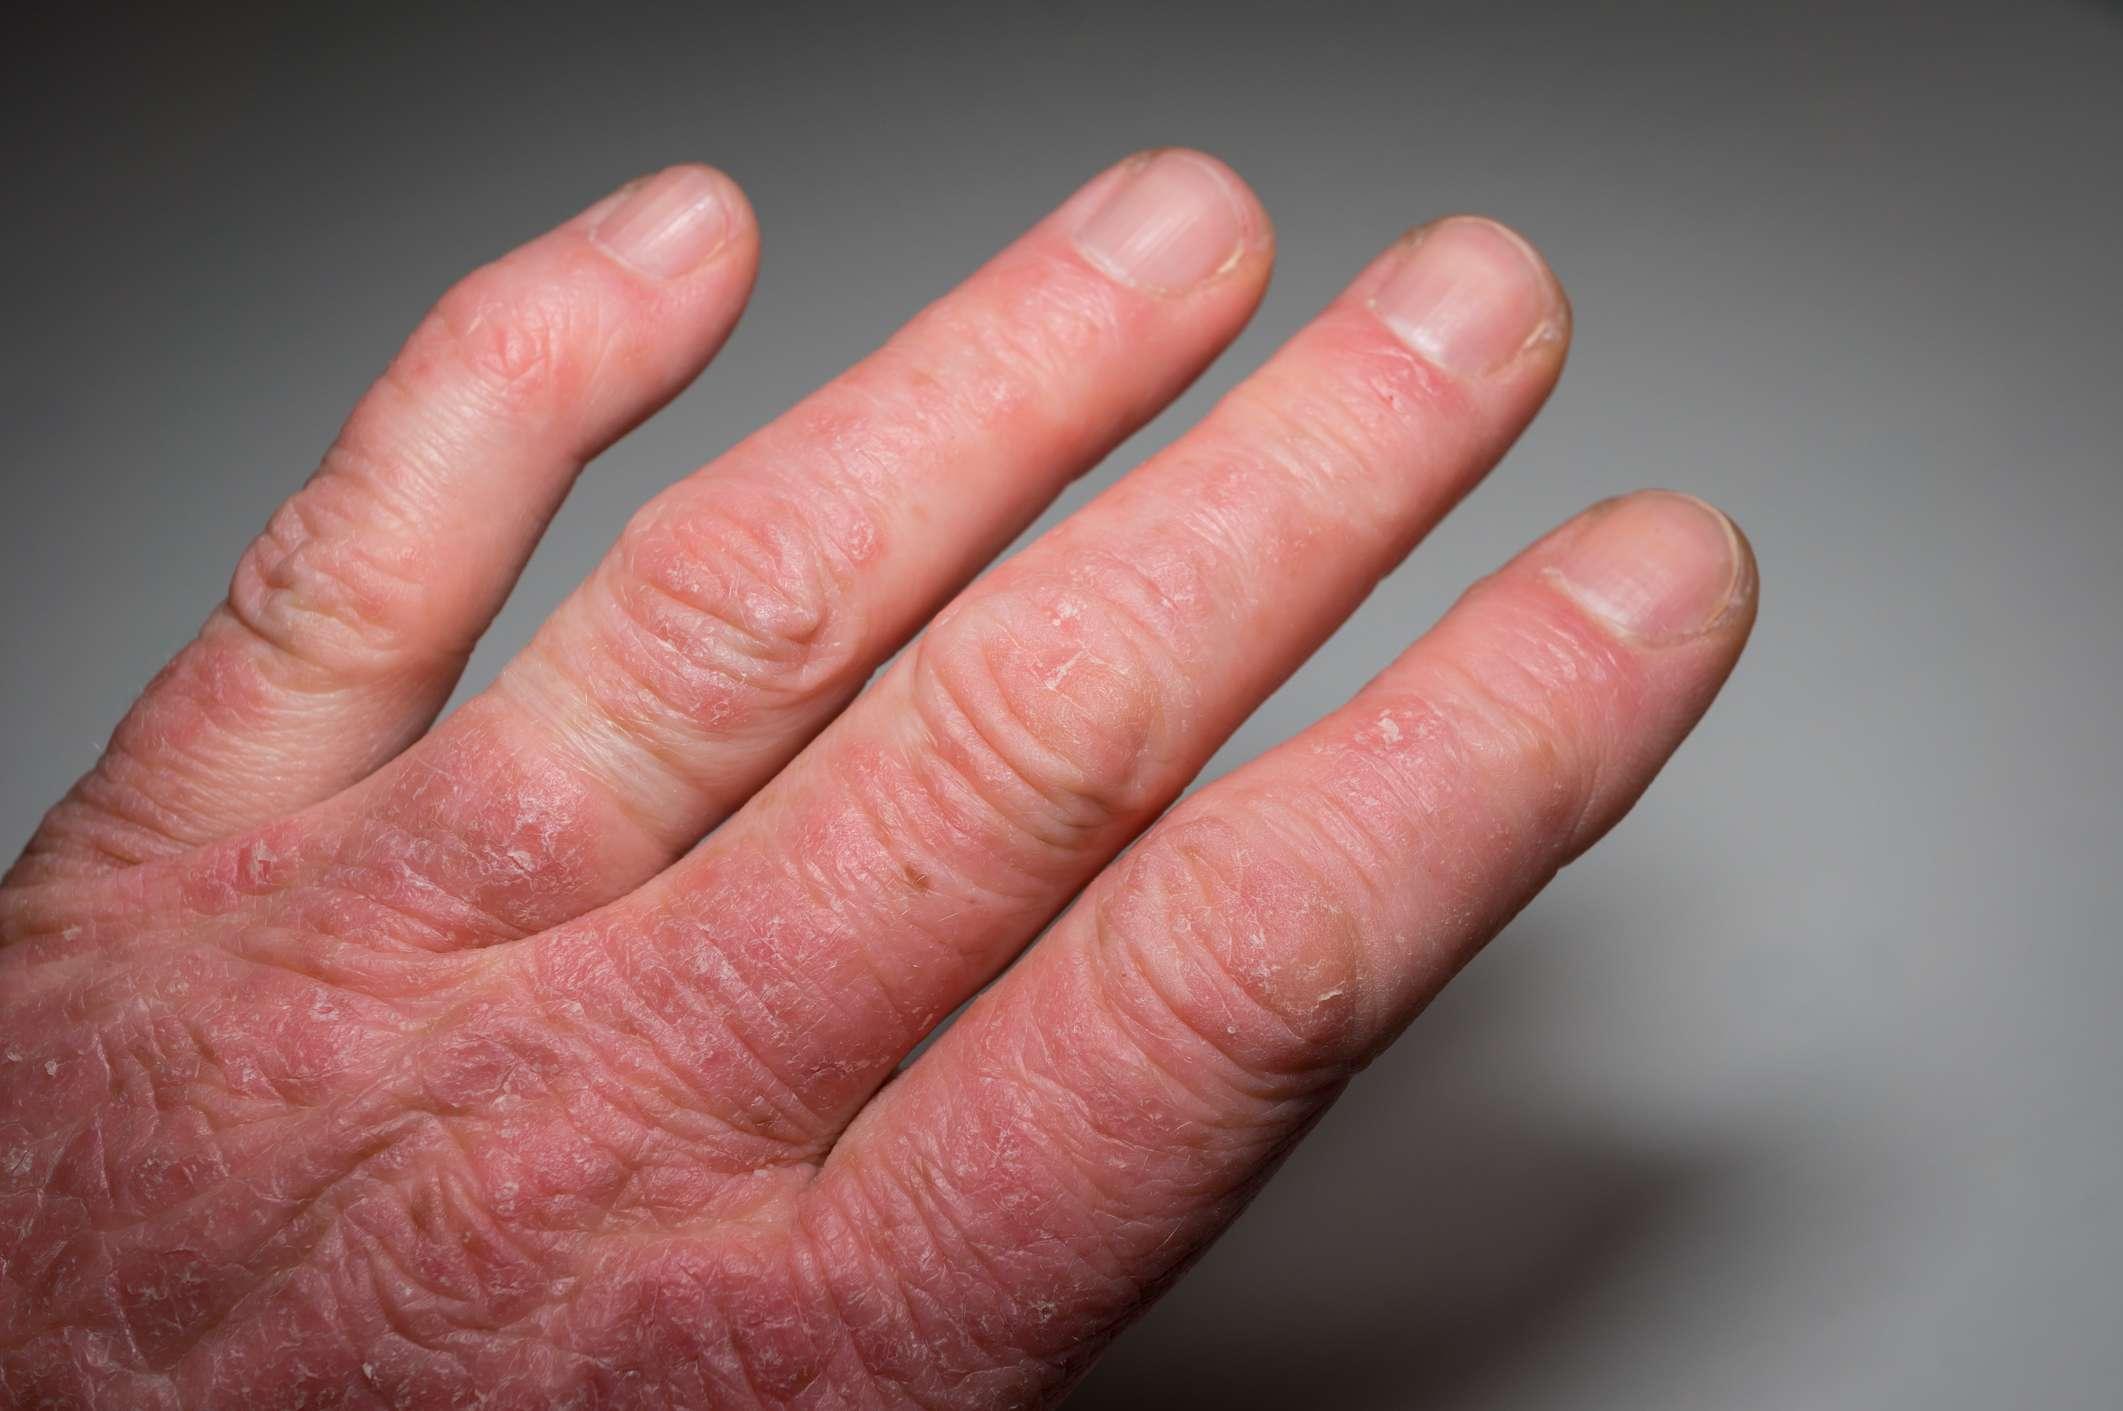 Hand with psoriatic arthritis